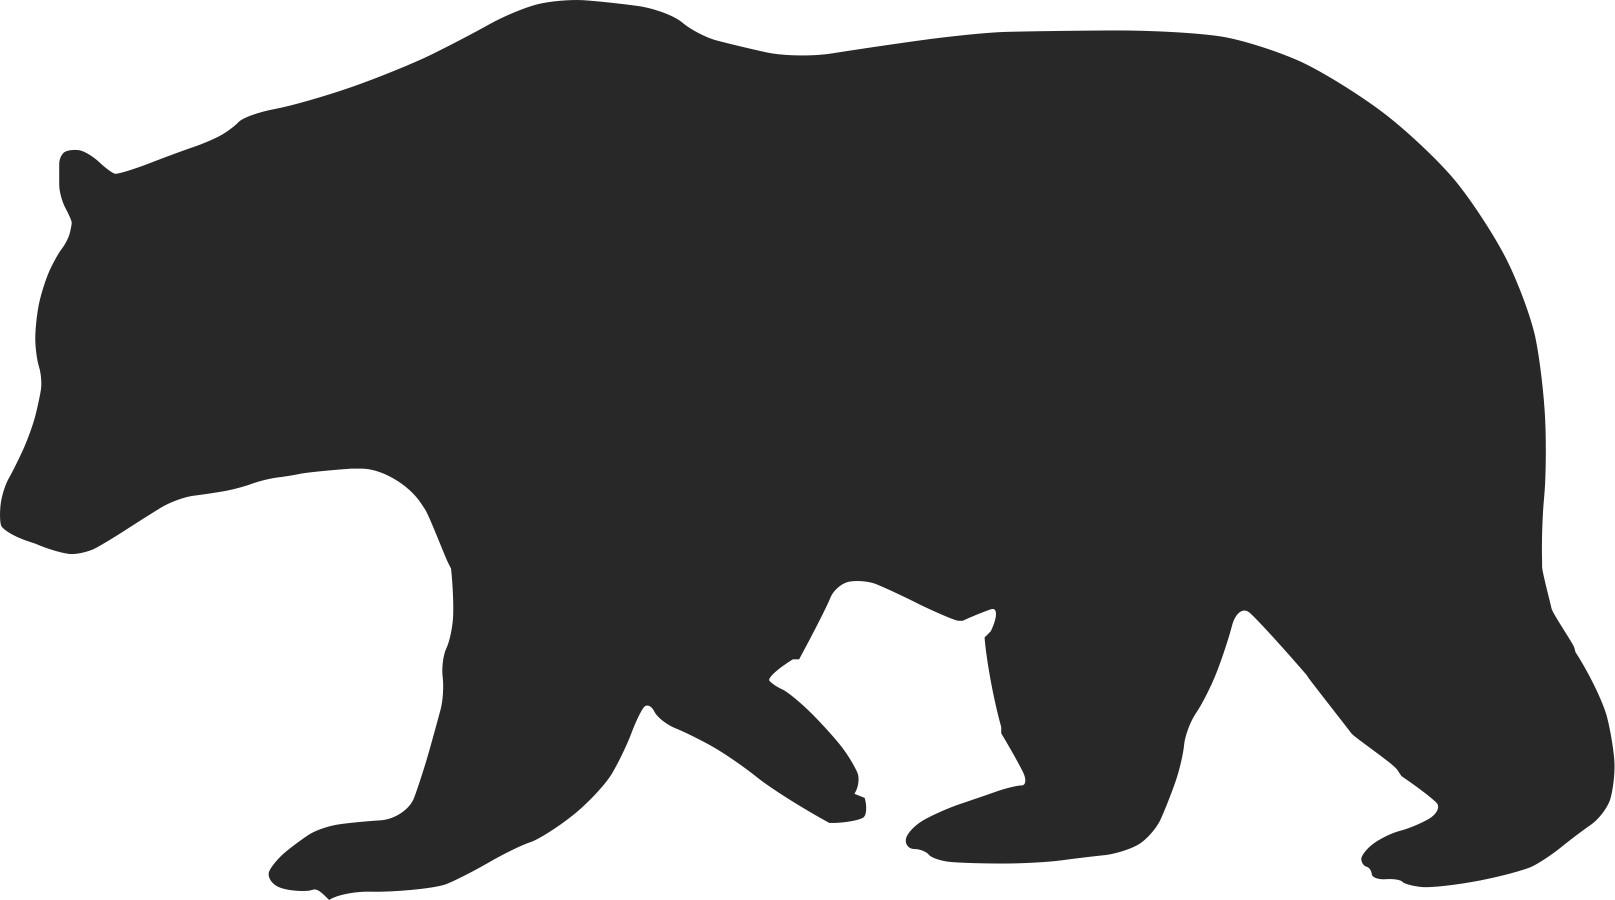 Mama bear clip art svg freeuse stock 17 Best ideas about Bear Silhouette on Pinterest   Animal ... svg freeuse stock